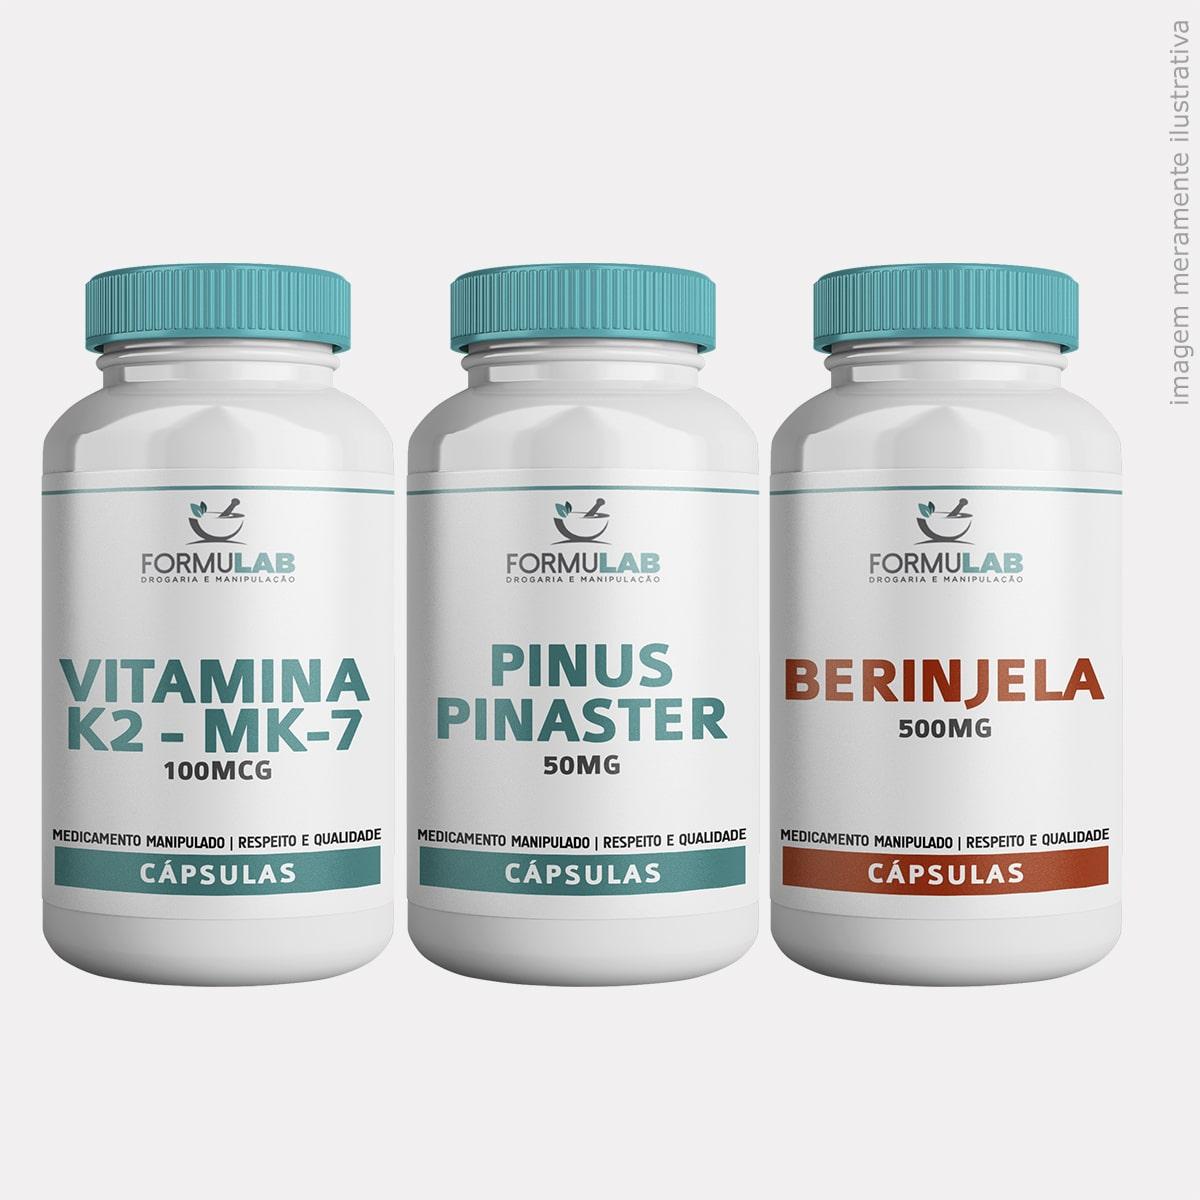 Kit SAÚDE - Vitamina k2 - mk7 - 100mcg + Pinus Pinaster 50mg + Berinjela 500mg